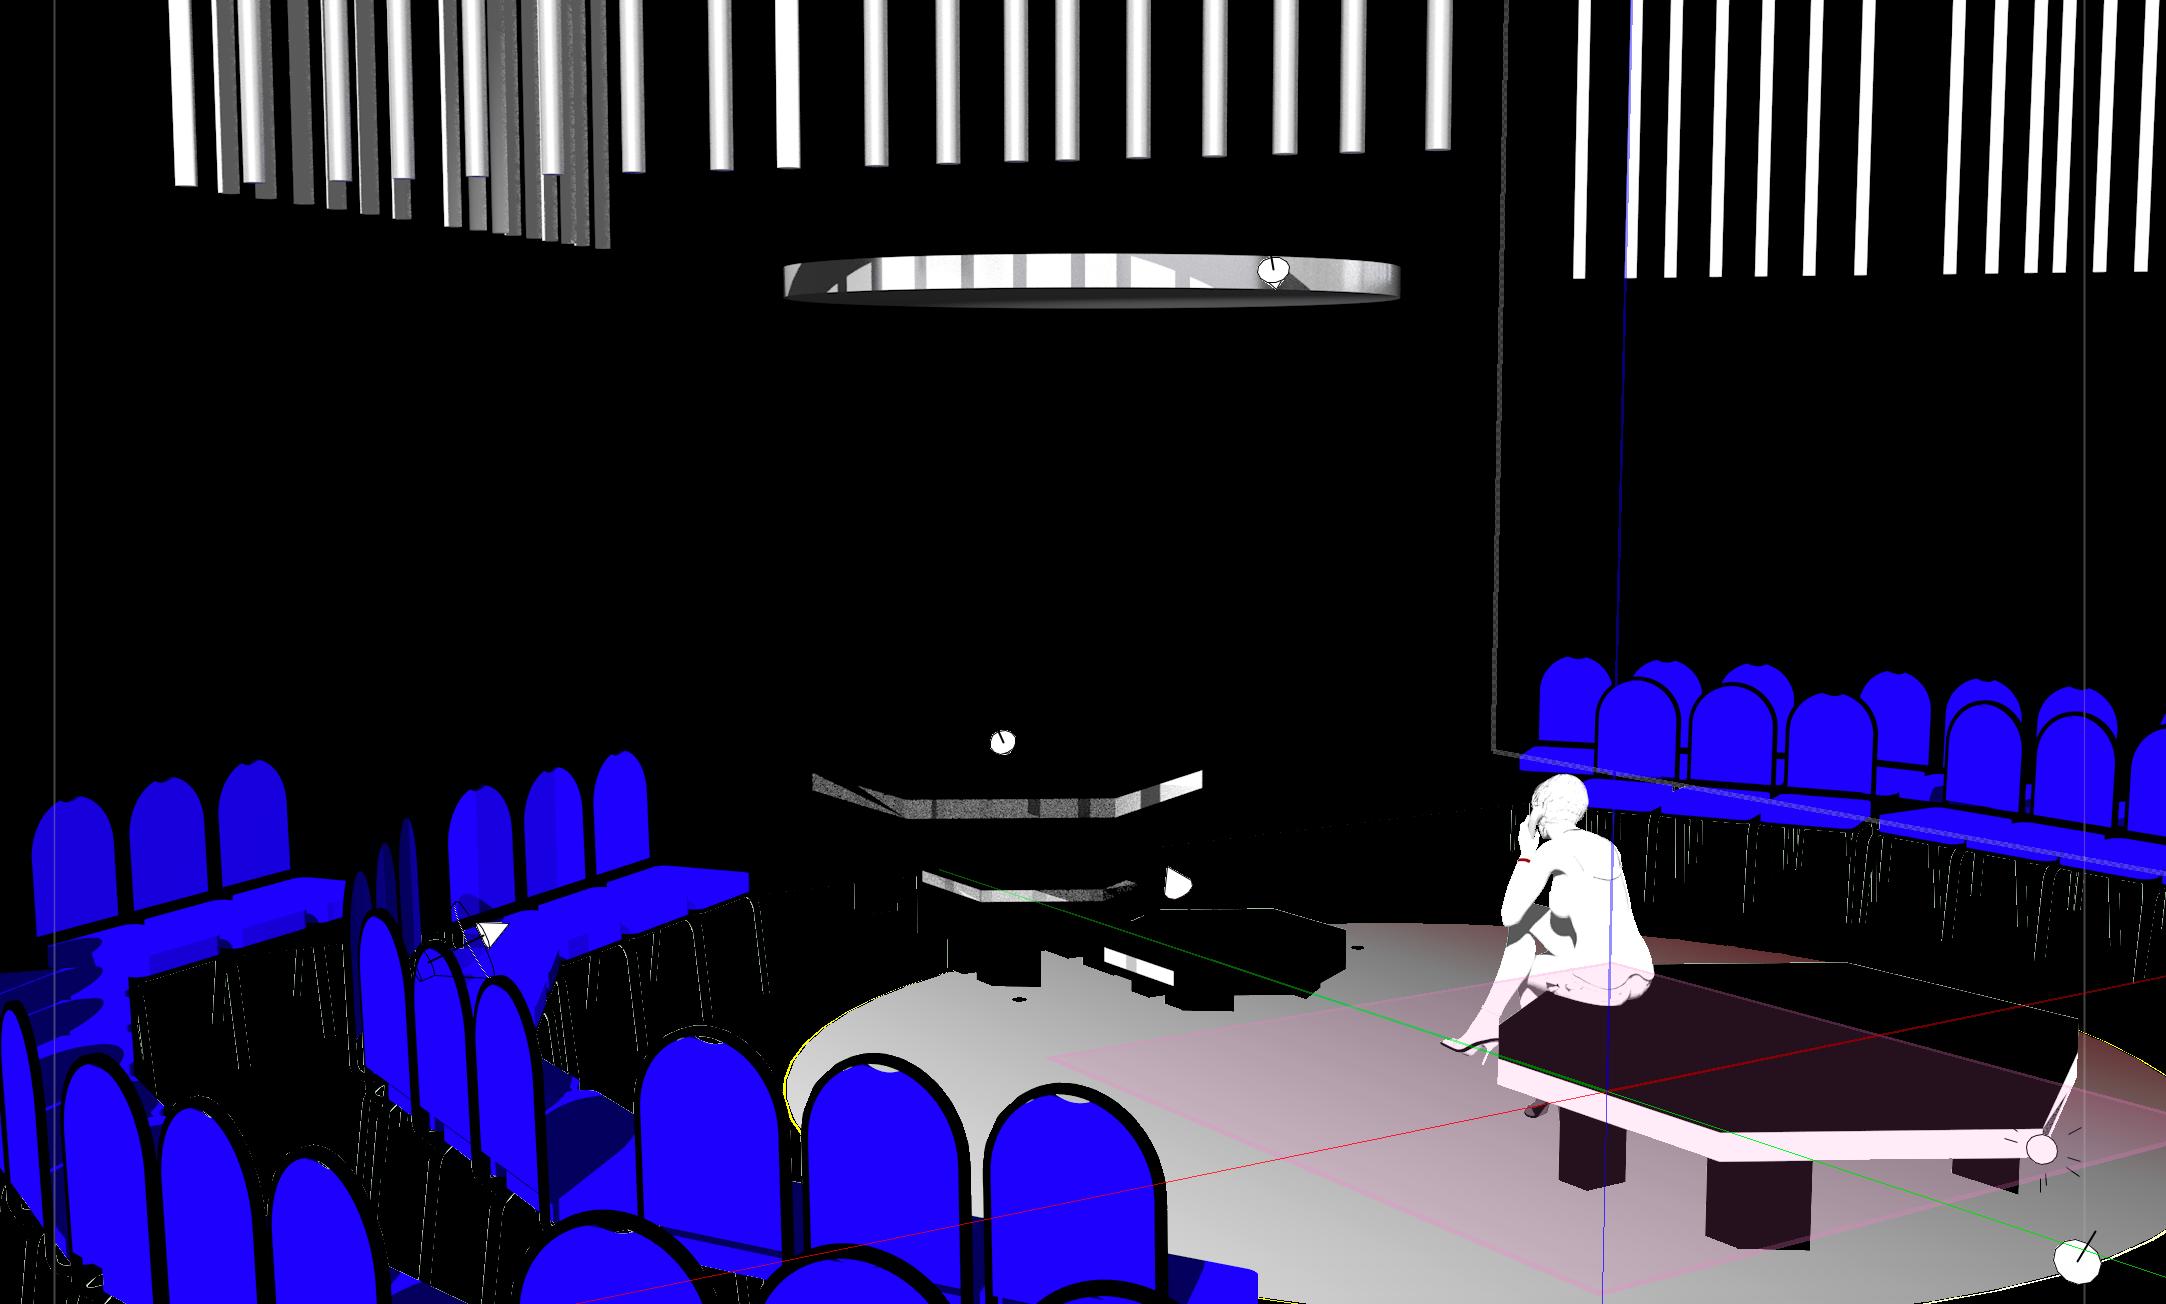 https://theatrefilm.ubc.ca/wp-content/uploads/sites/21/2020/04/header-Constellations-set-1.png